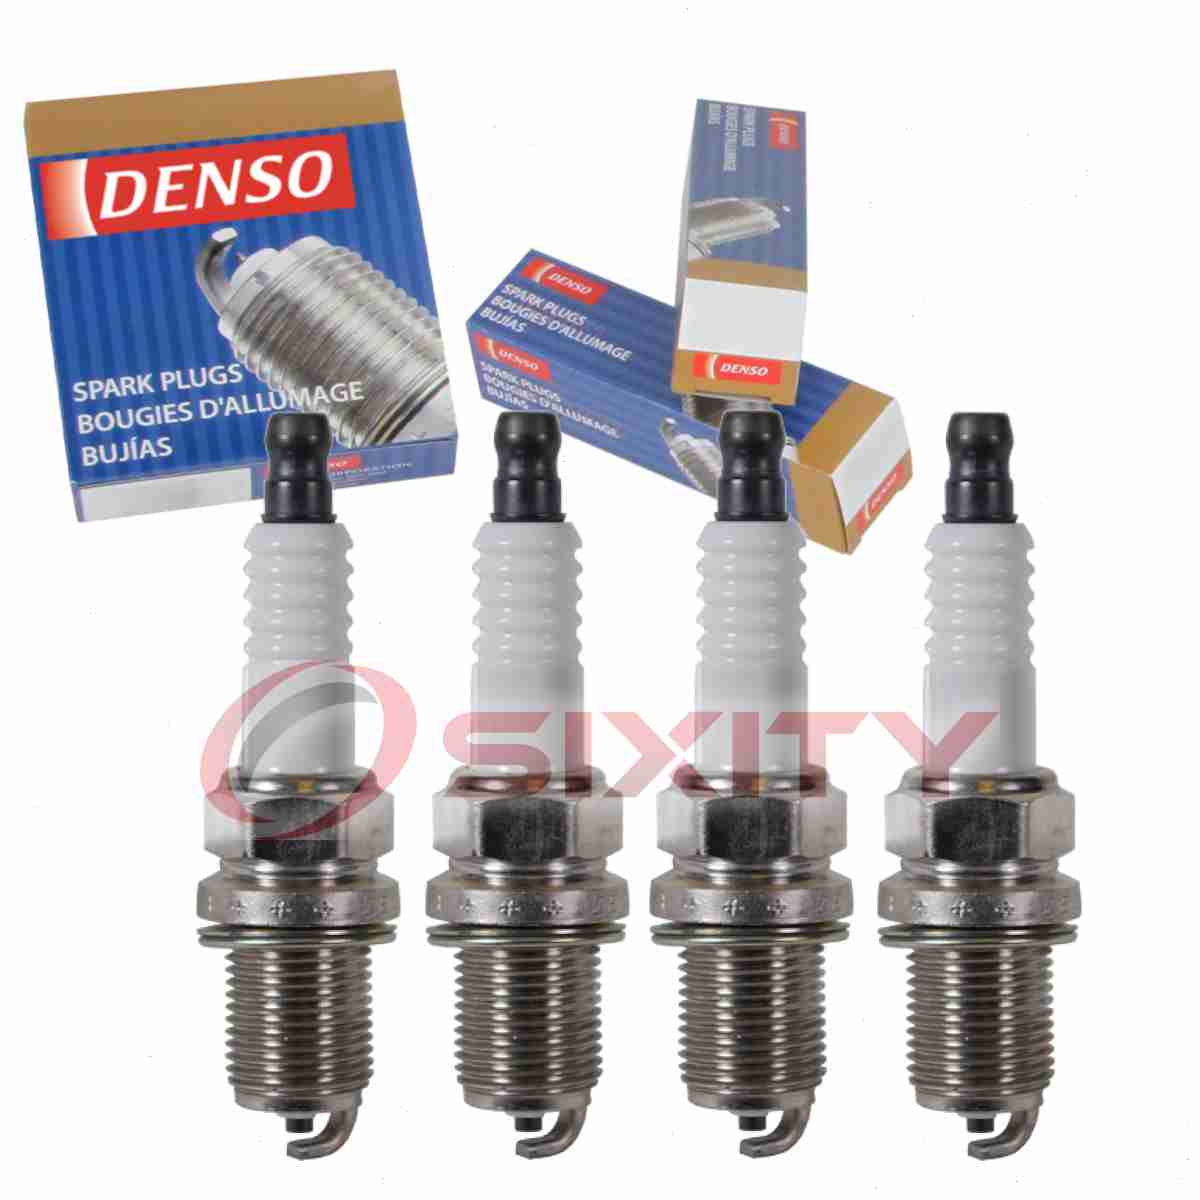 4 Denso Platinum TT Spark Plugs for Suzuki SX4 2.0L L4 2007-2010 Tune Up